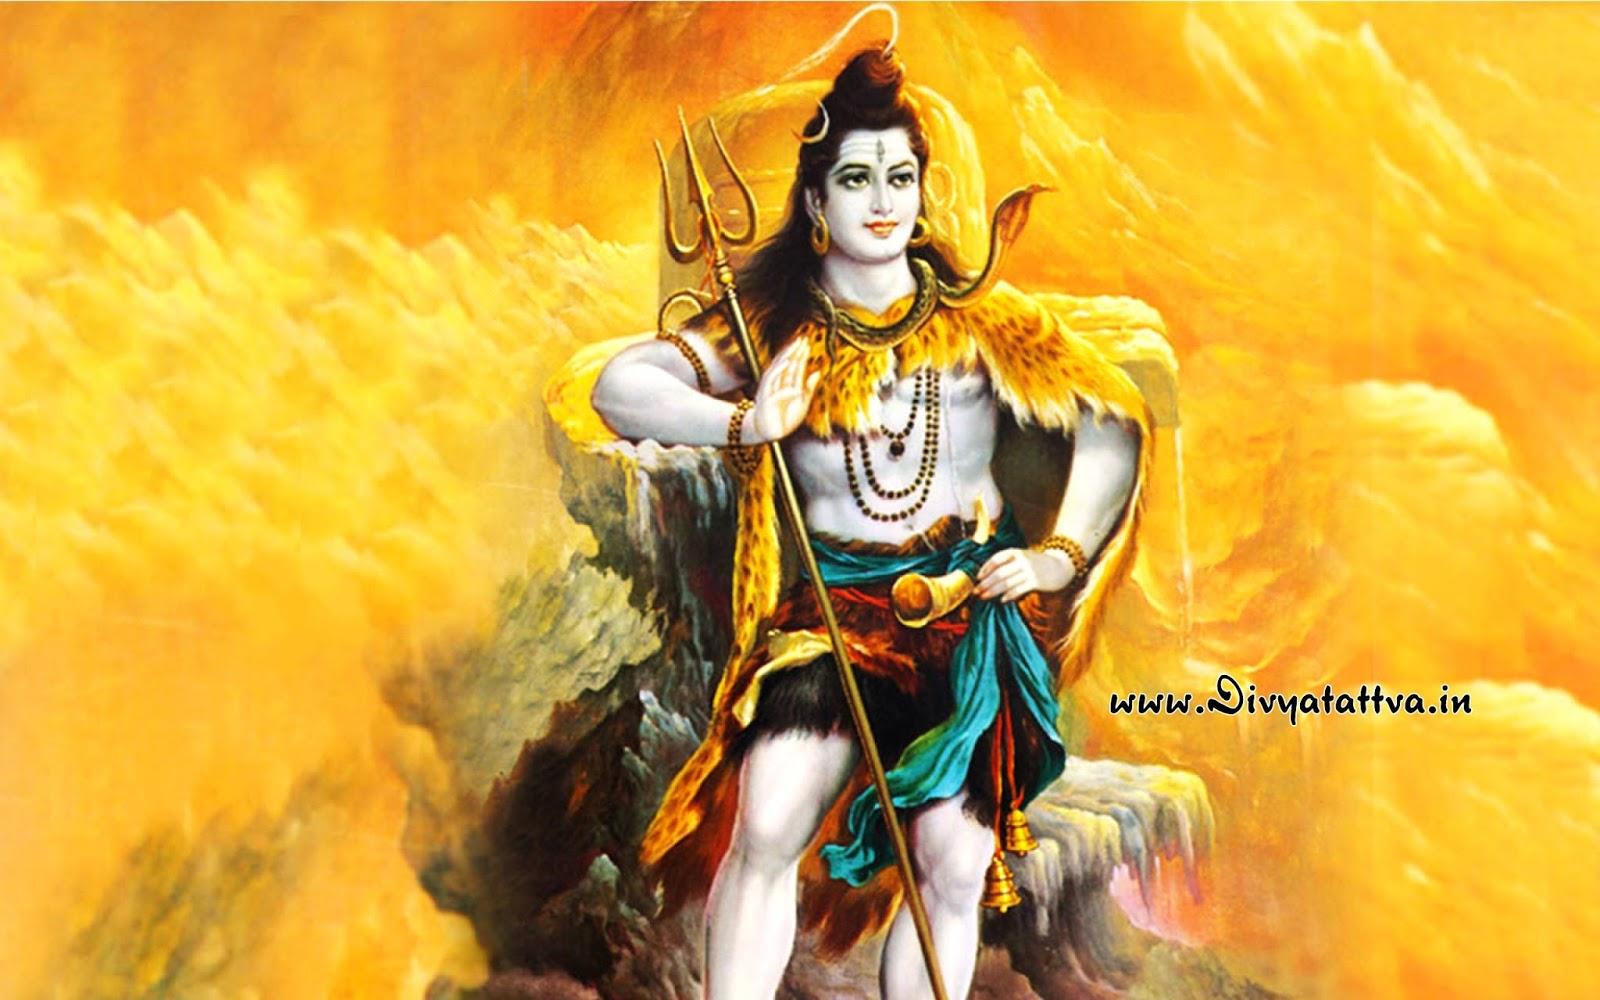 Best Wallpaper High Quality Shiva - Lord-Shiva-HQ-Desktop-Wallpaper-hinuism-spiritual-natraja-shiv-backgrounds-www  HD_98831.jpg